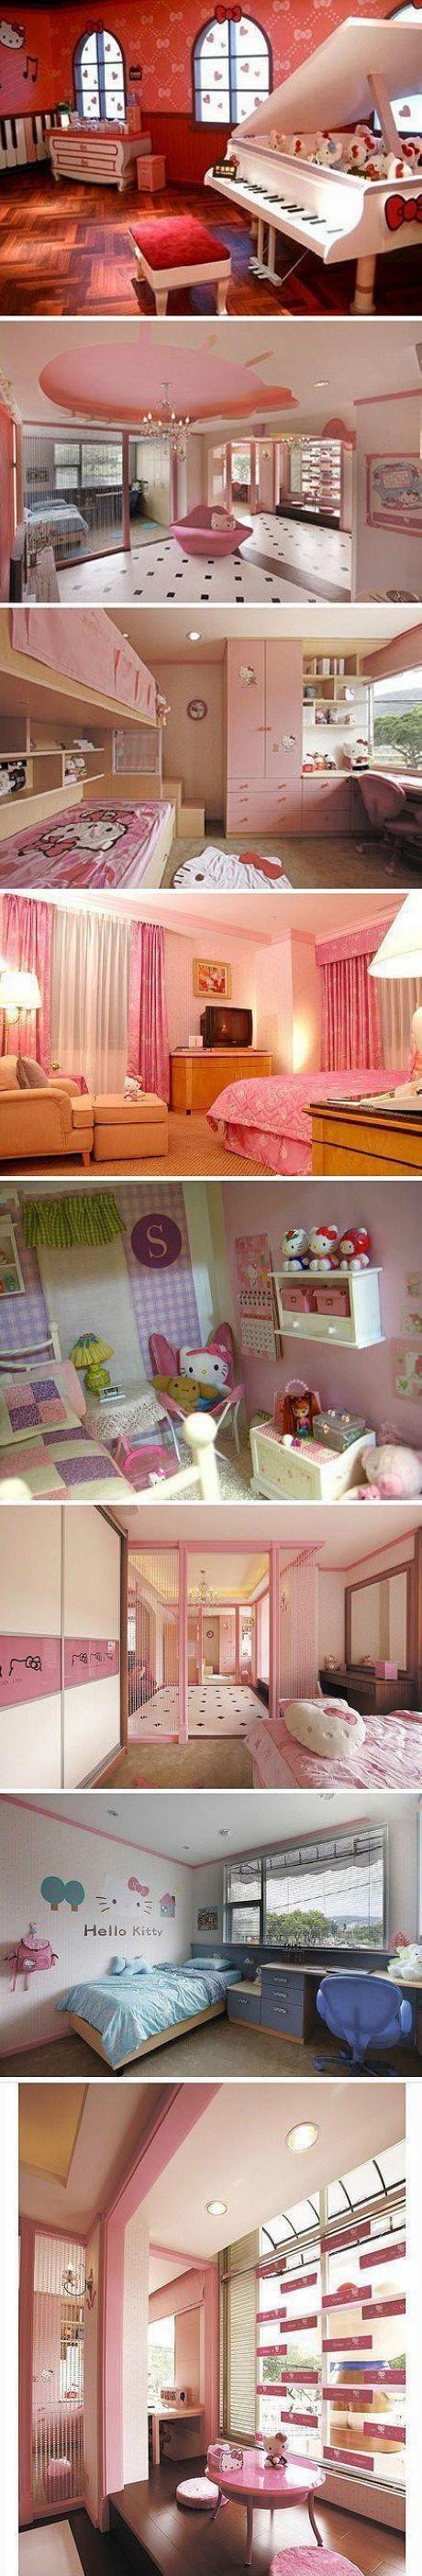 Hello Kitty themed home decor ideas @Judy Hilkert